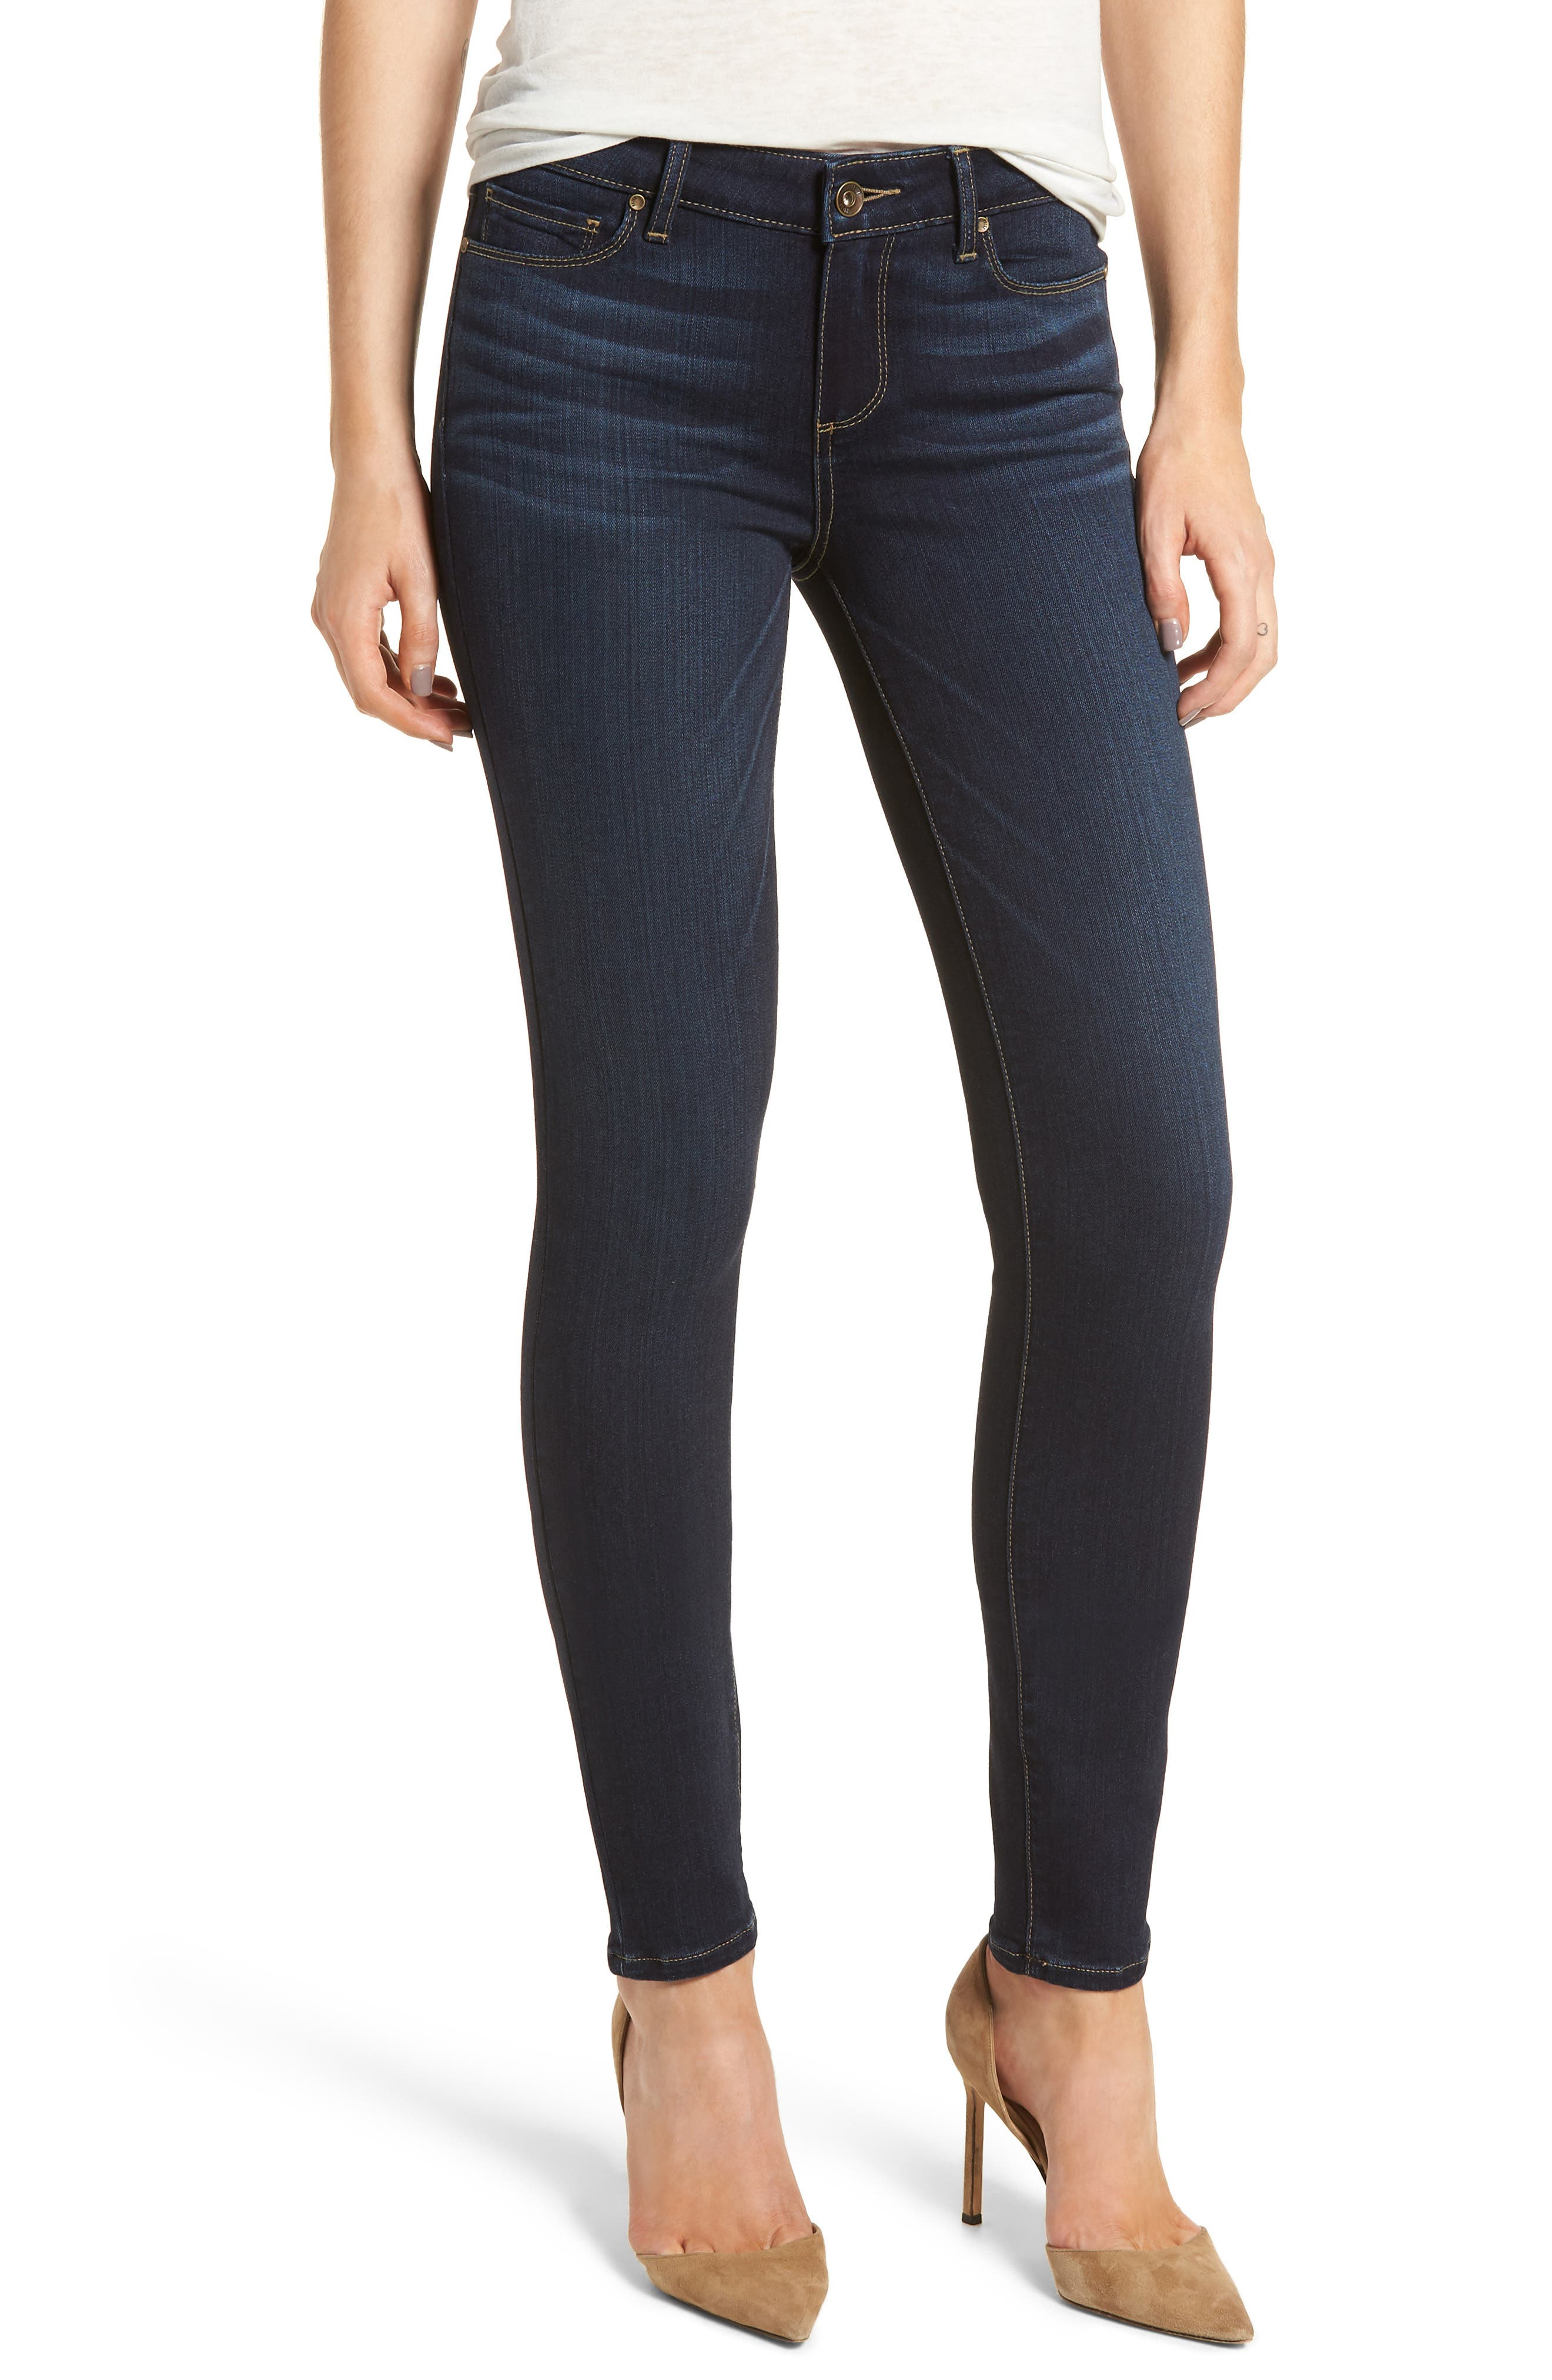 Transcend - Verdugo Ultra Skinny Jeans,                             Main thumbnail 1, color,                             400